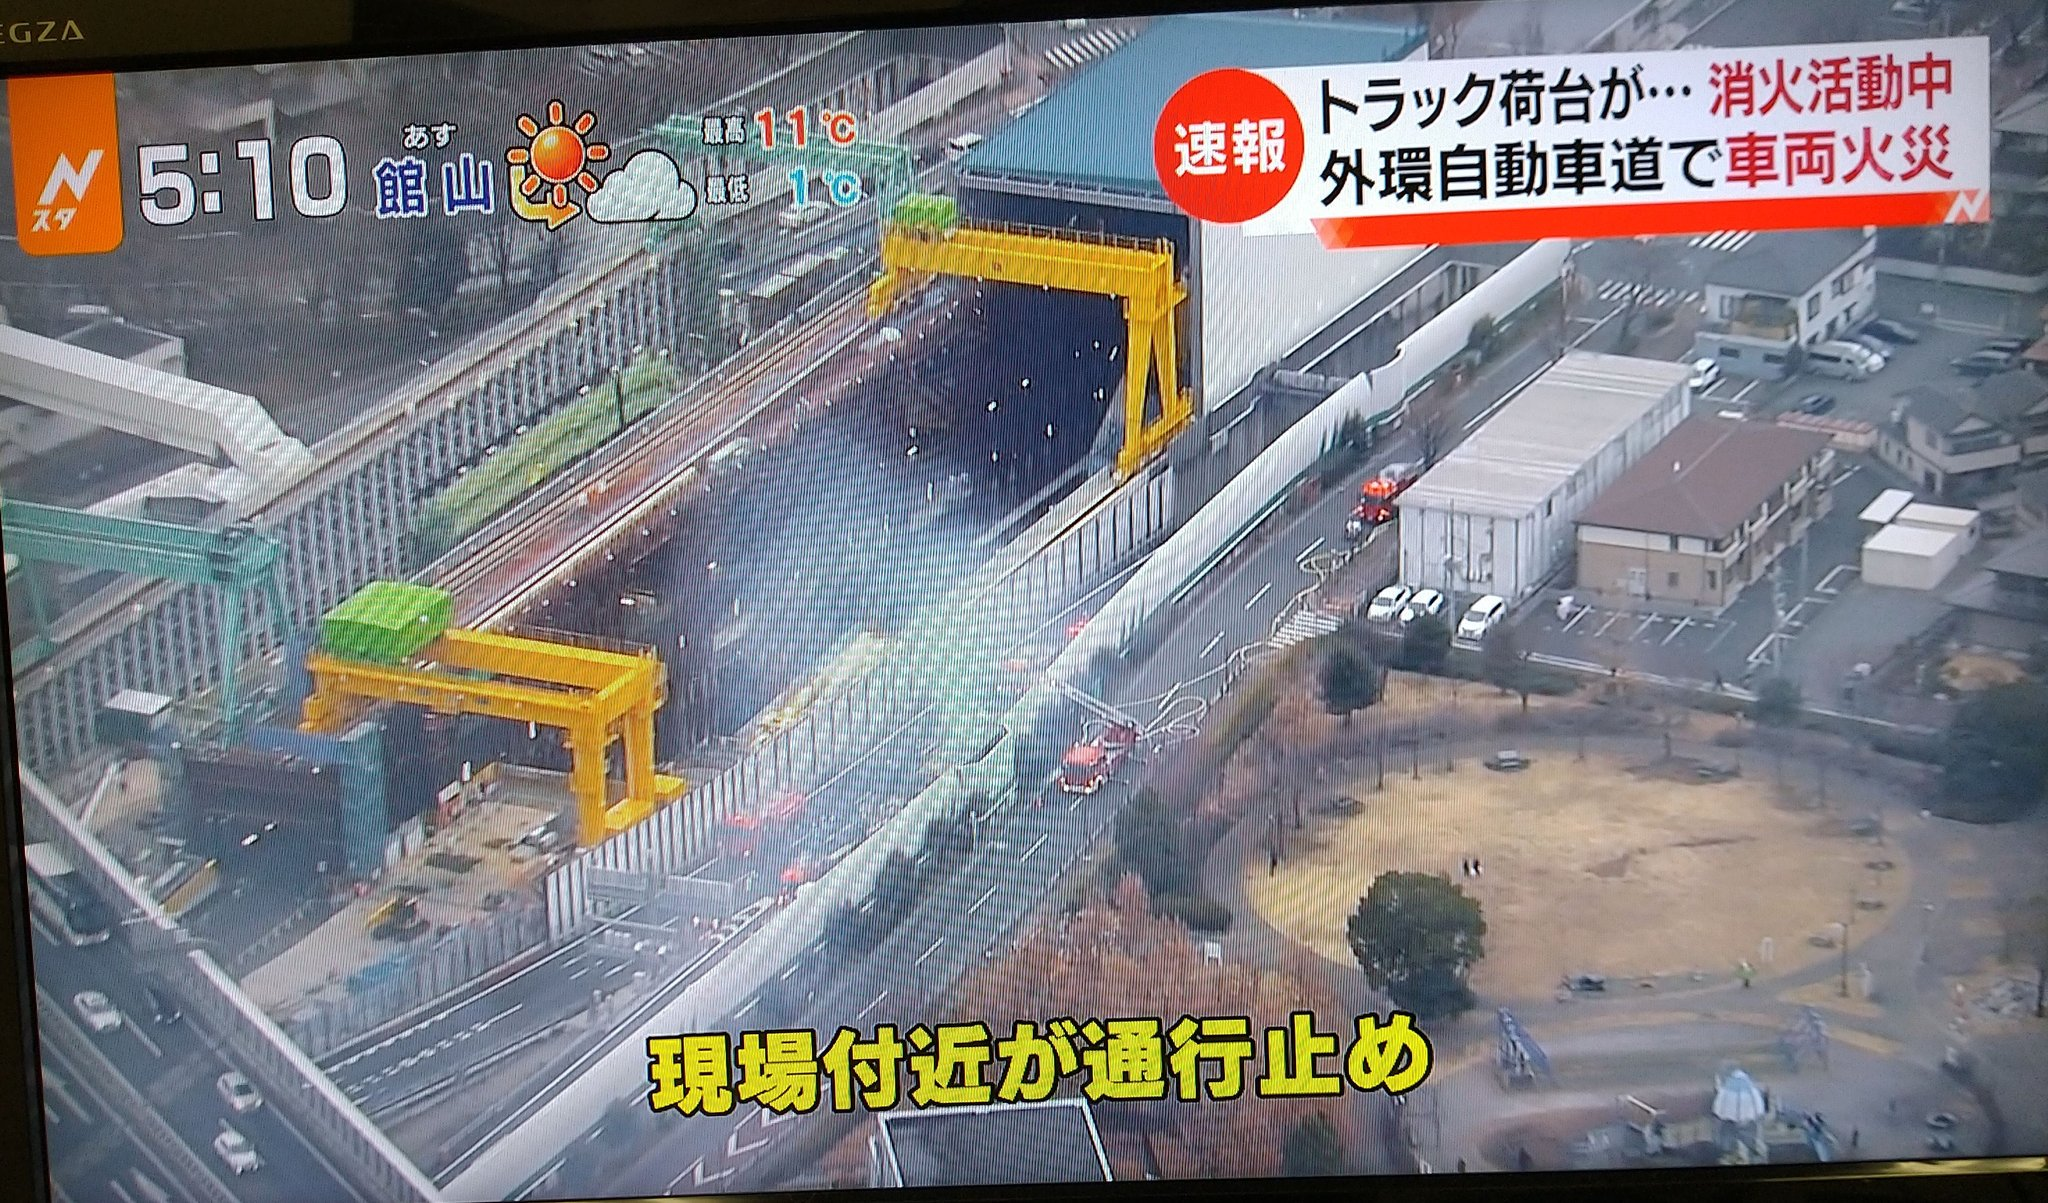 画像,外環大泉JCT付近で事故! https://t.co/ee7qFU6MuJ。